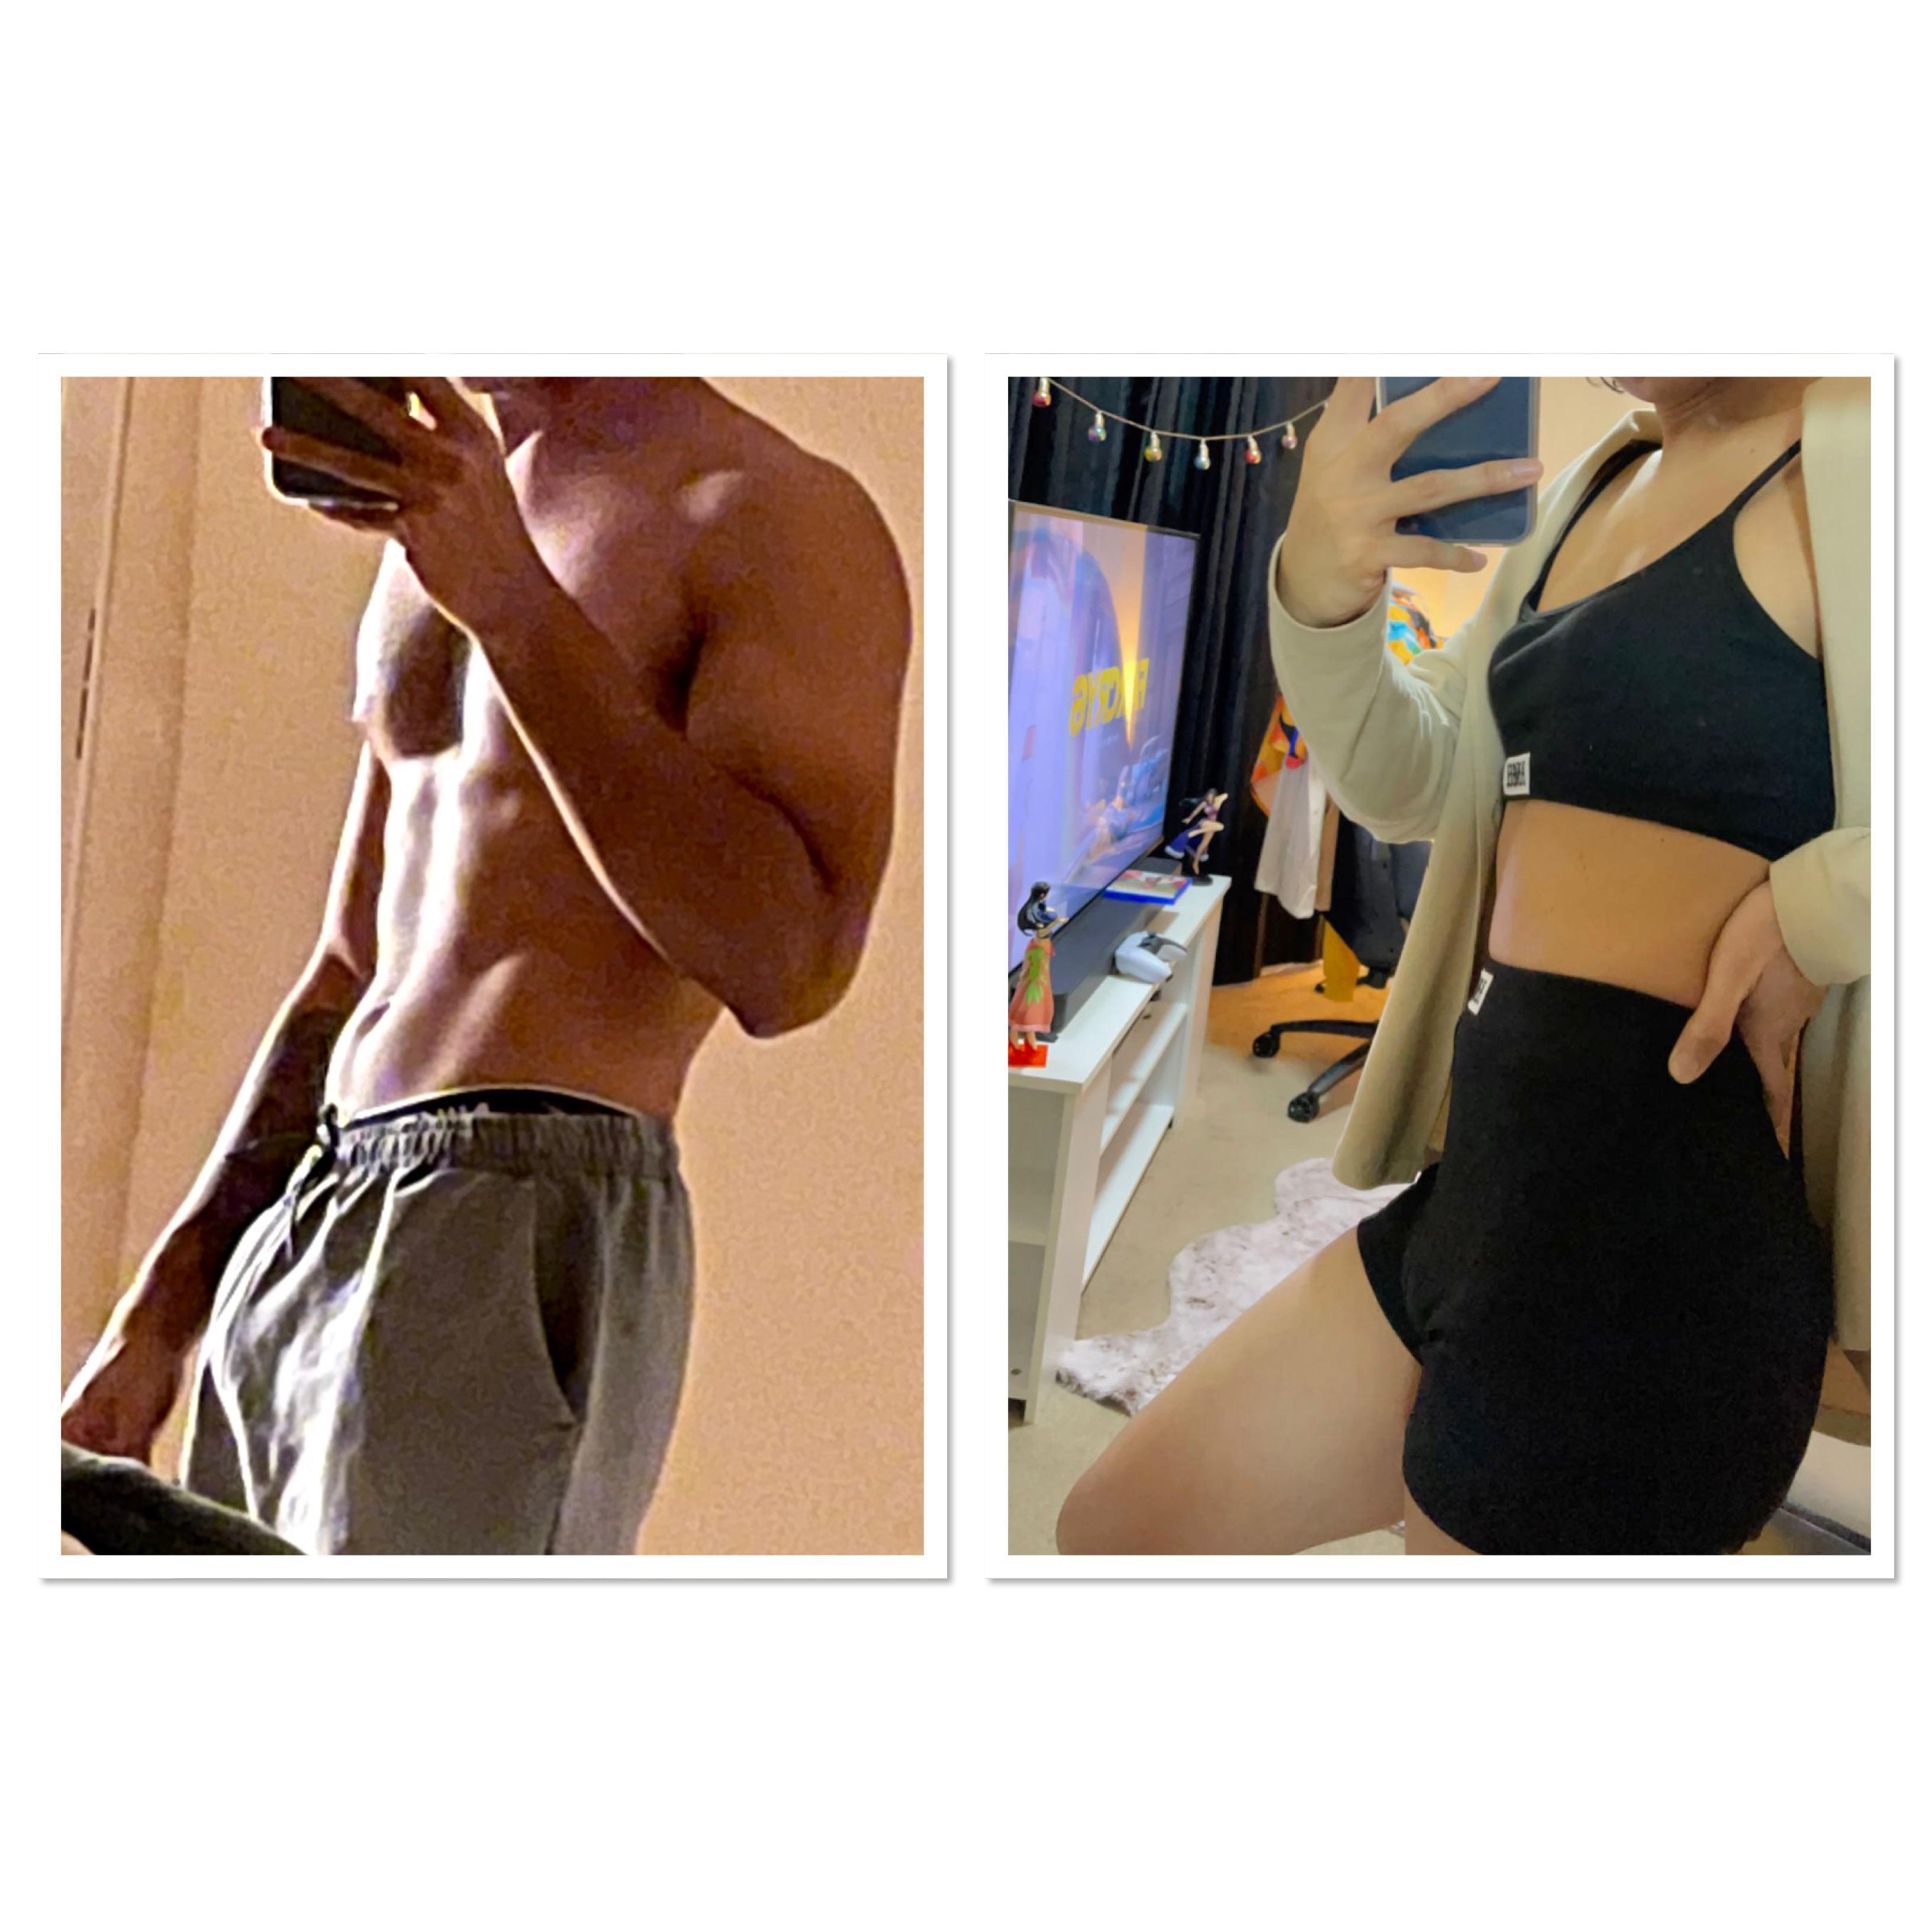 5'8 Female 28 lbs Fat Loss 165 lbs to 137 lbs